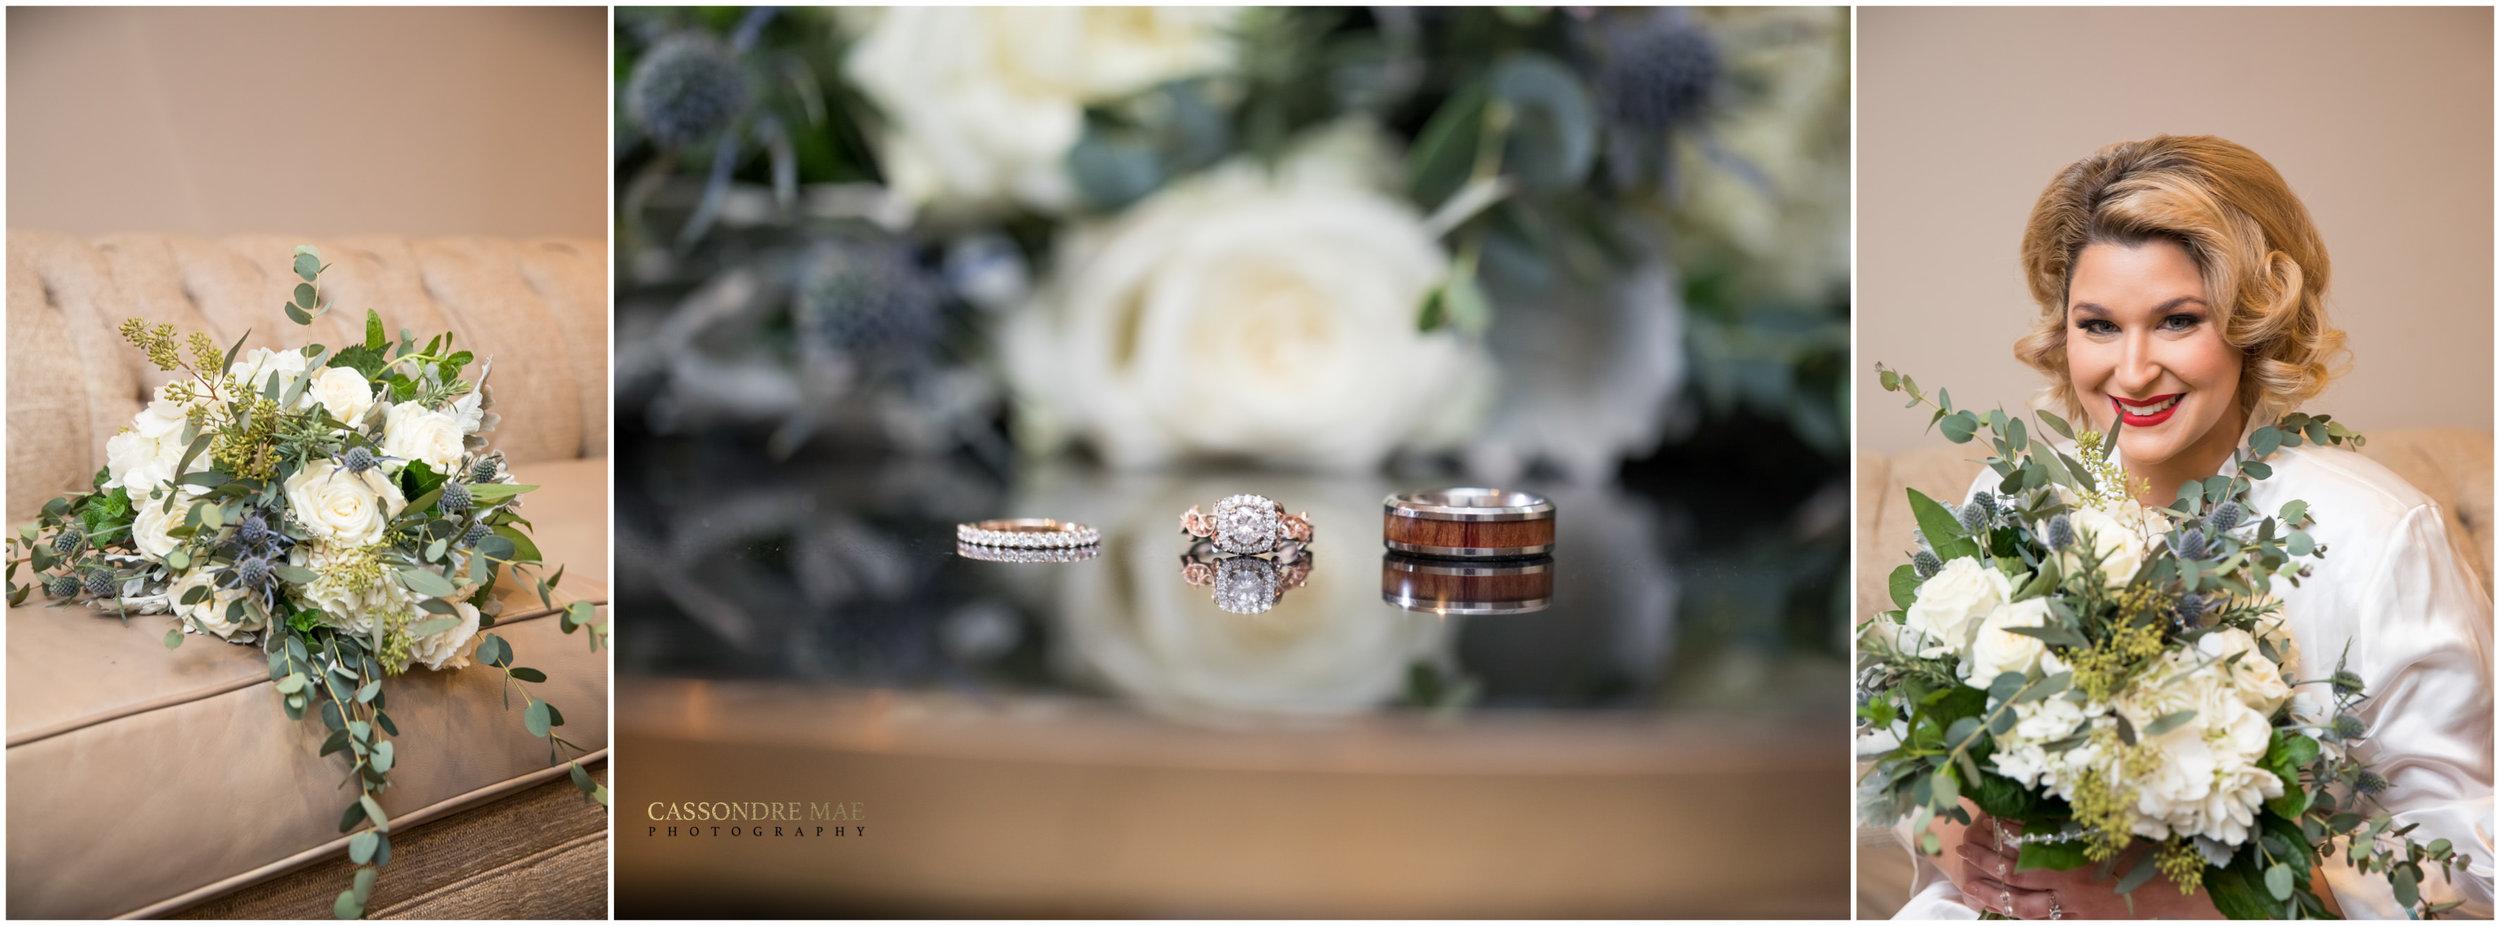 Cassondre Mae Photography Poughkeepsie NY Wedding 2.jpg